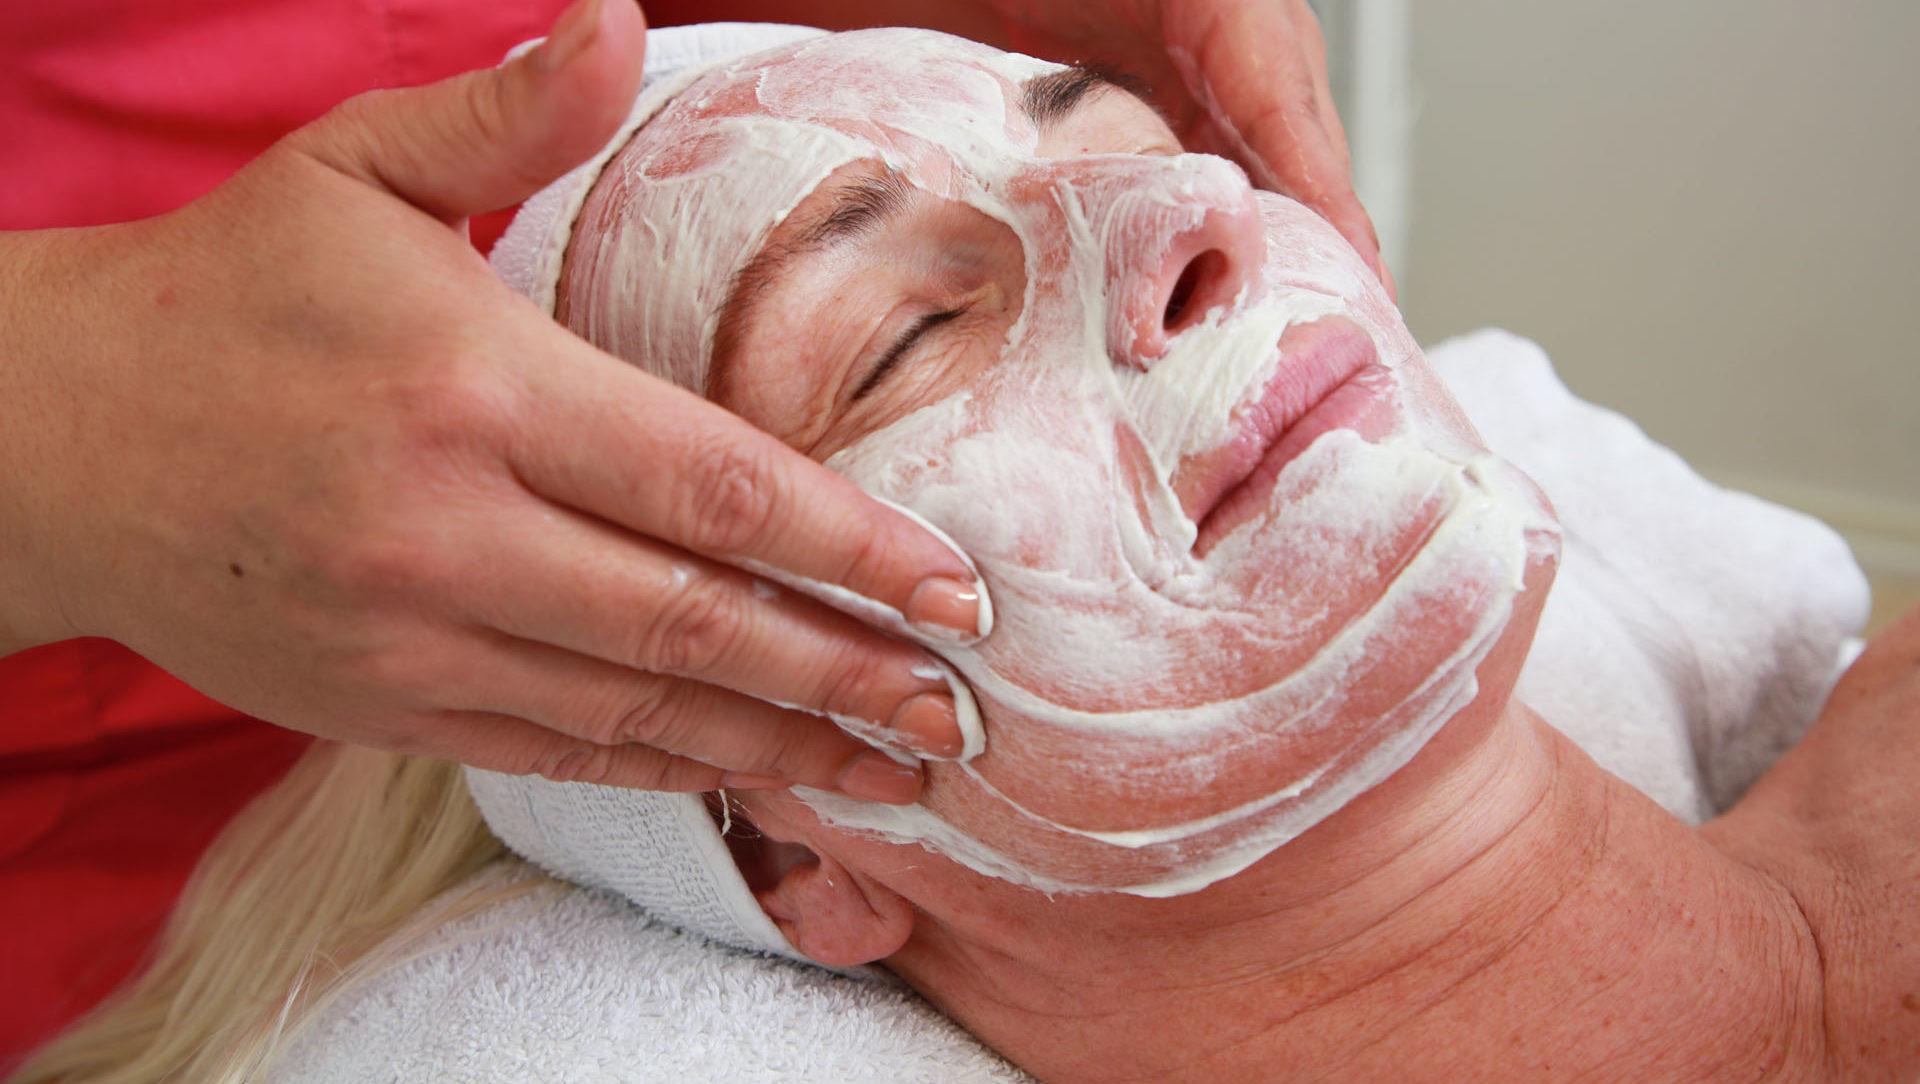 academie ansigtsbehandling